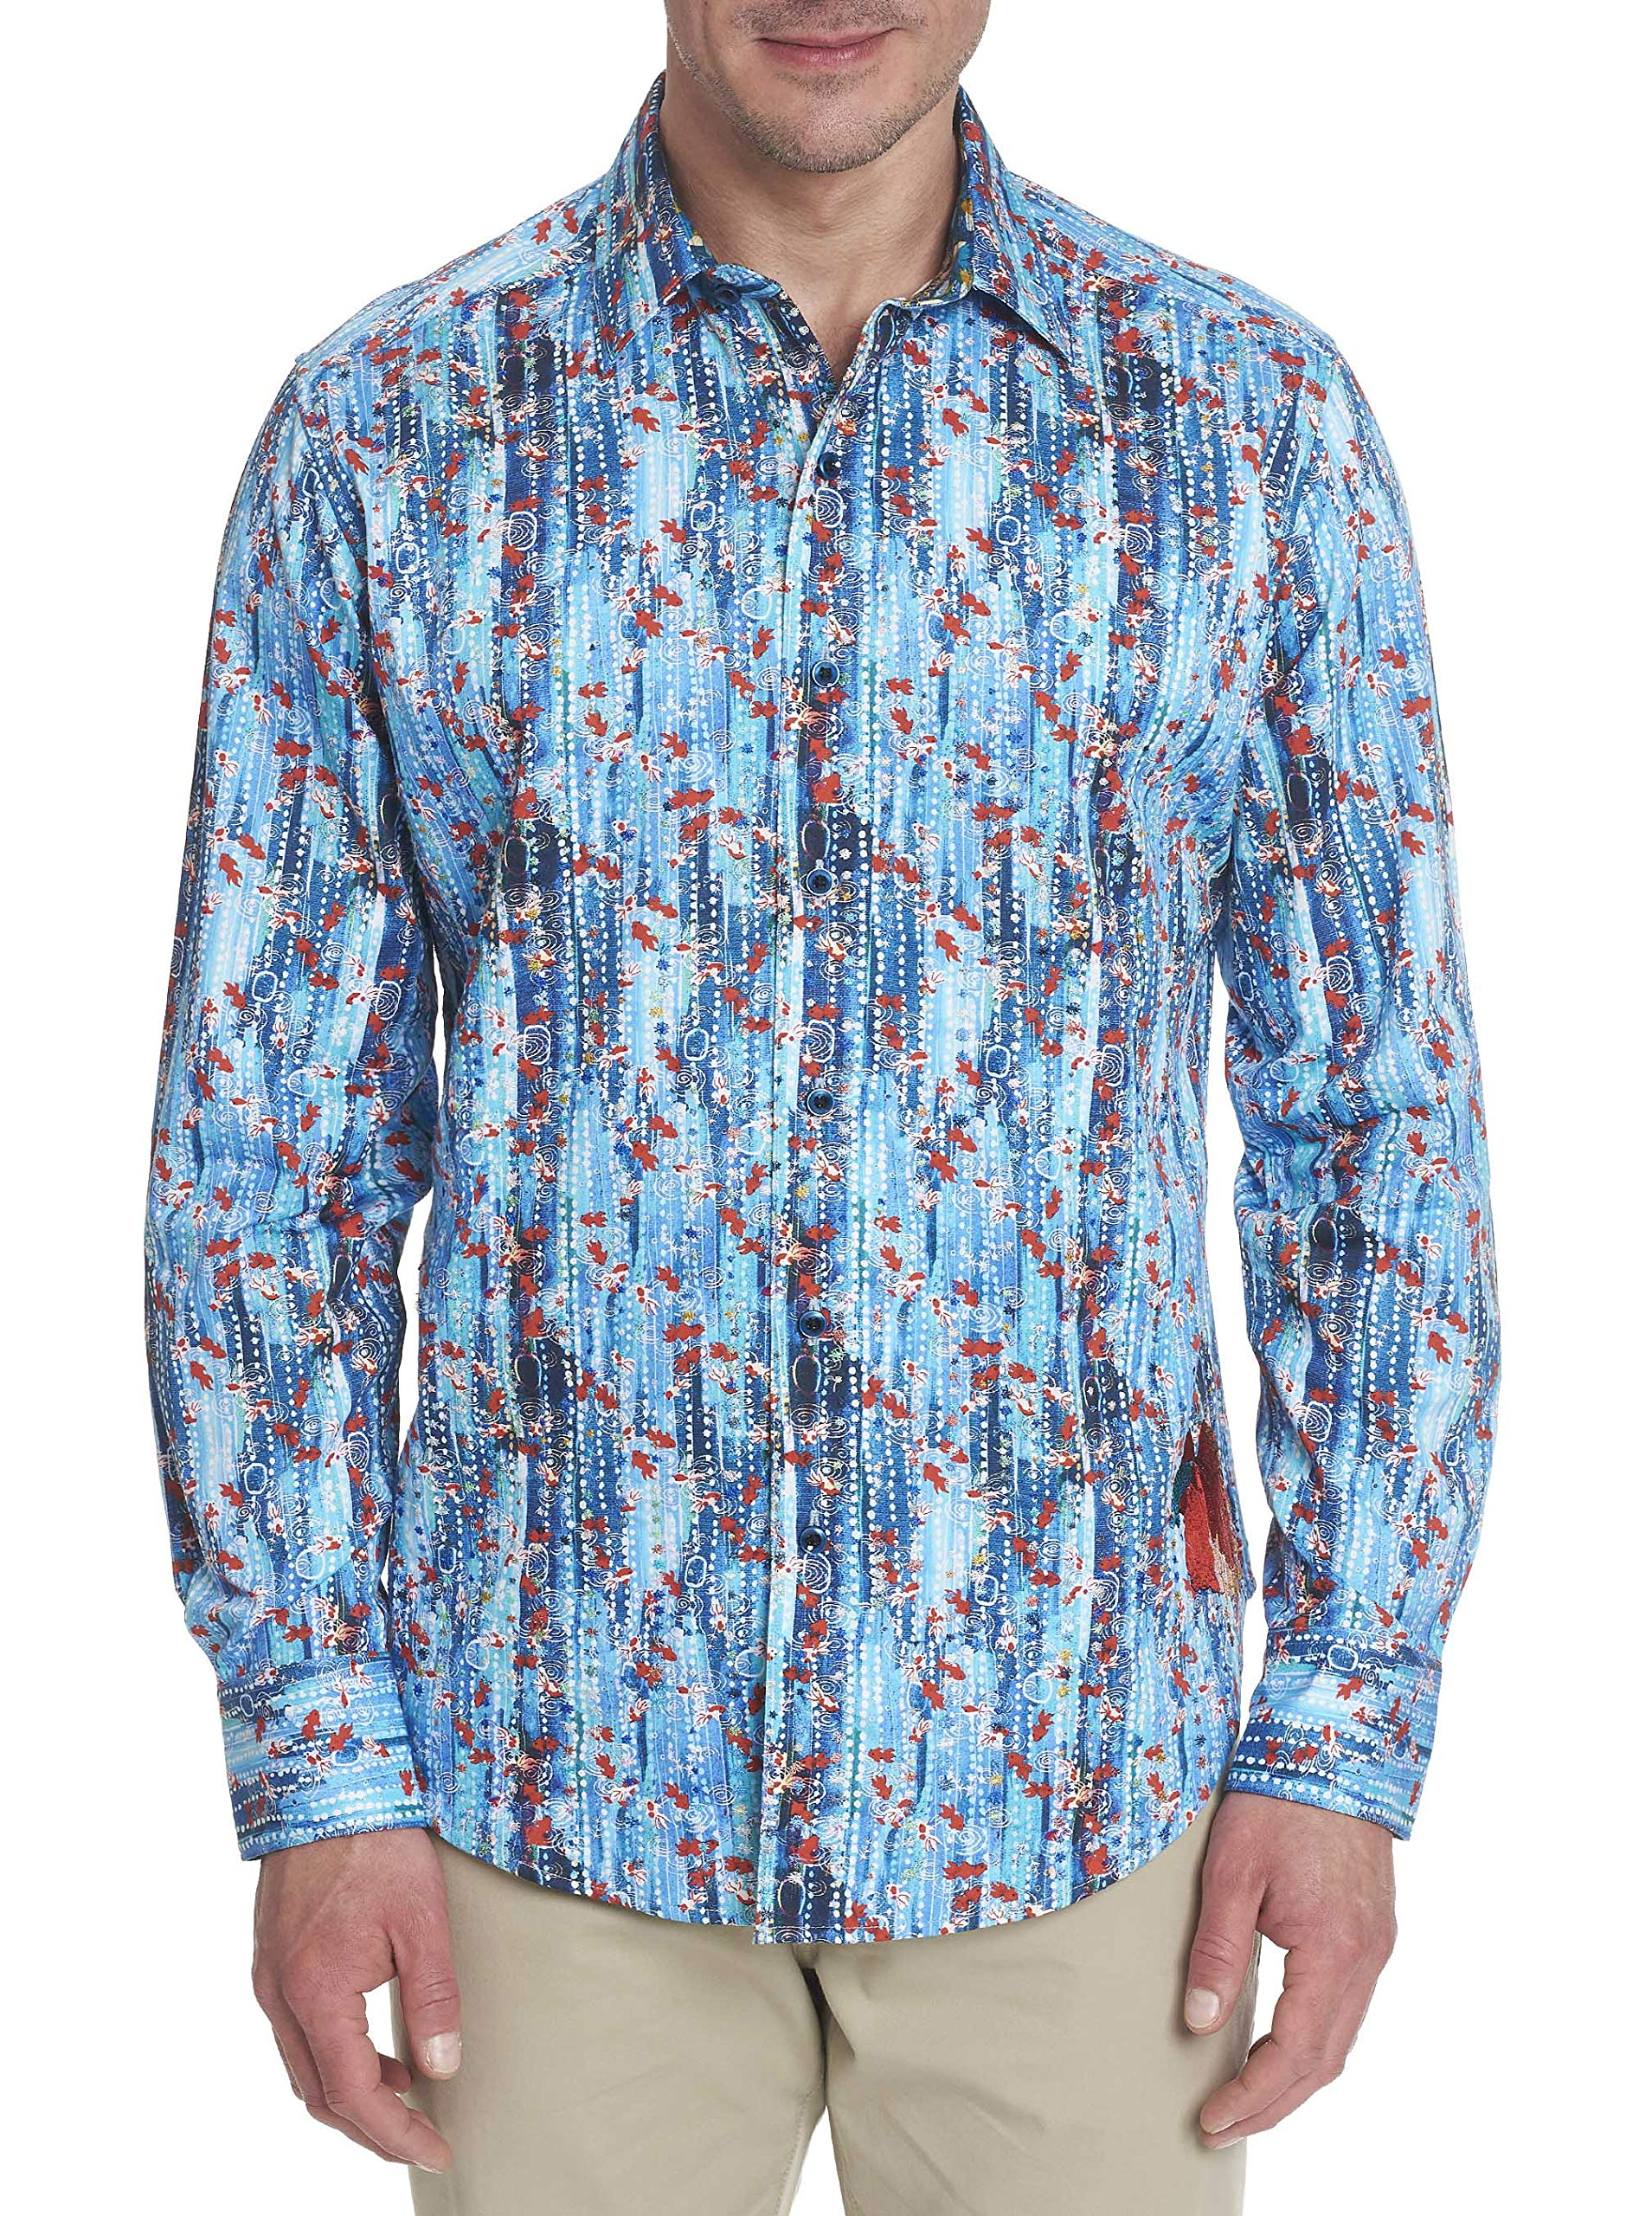 Robert Graham Aquarium L/S Shirt Classic Fit Teal Small by Robert Graham Designs